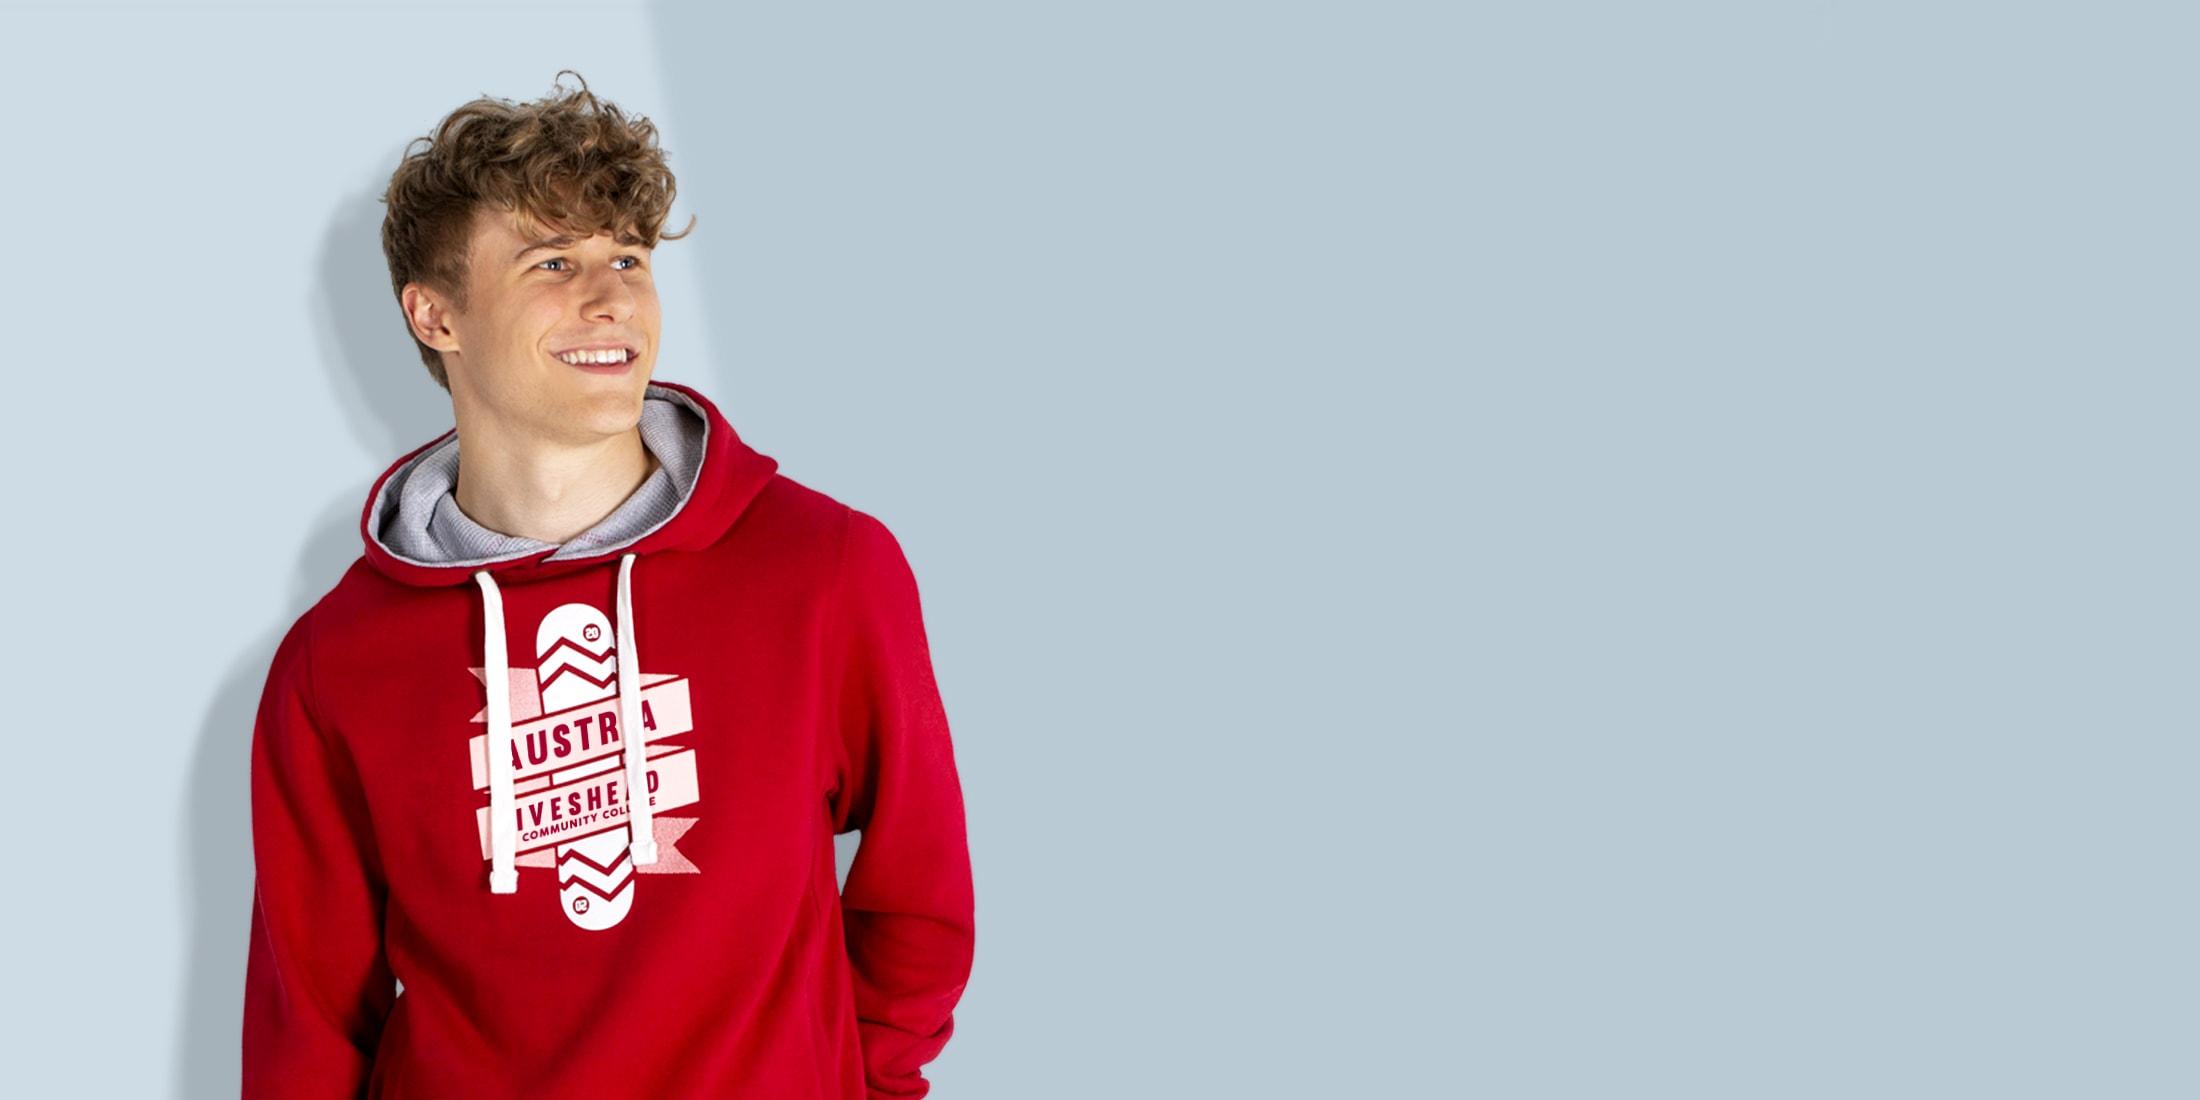 Ski trip season seasonaire hoodies and clothing